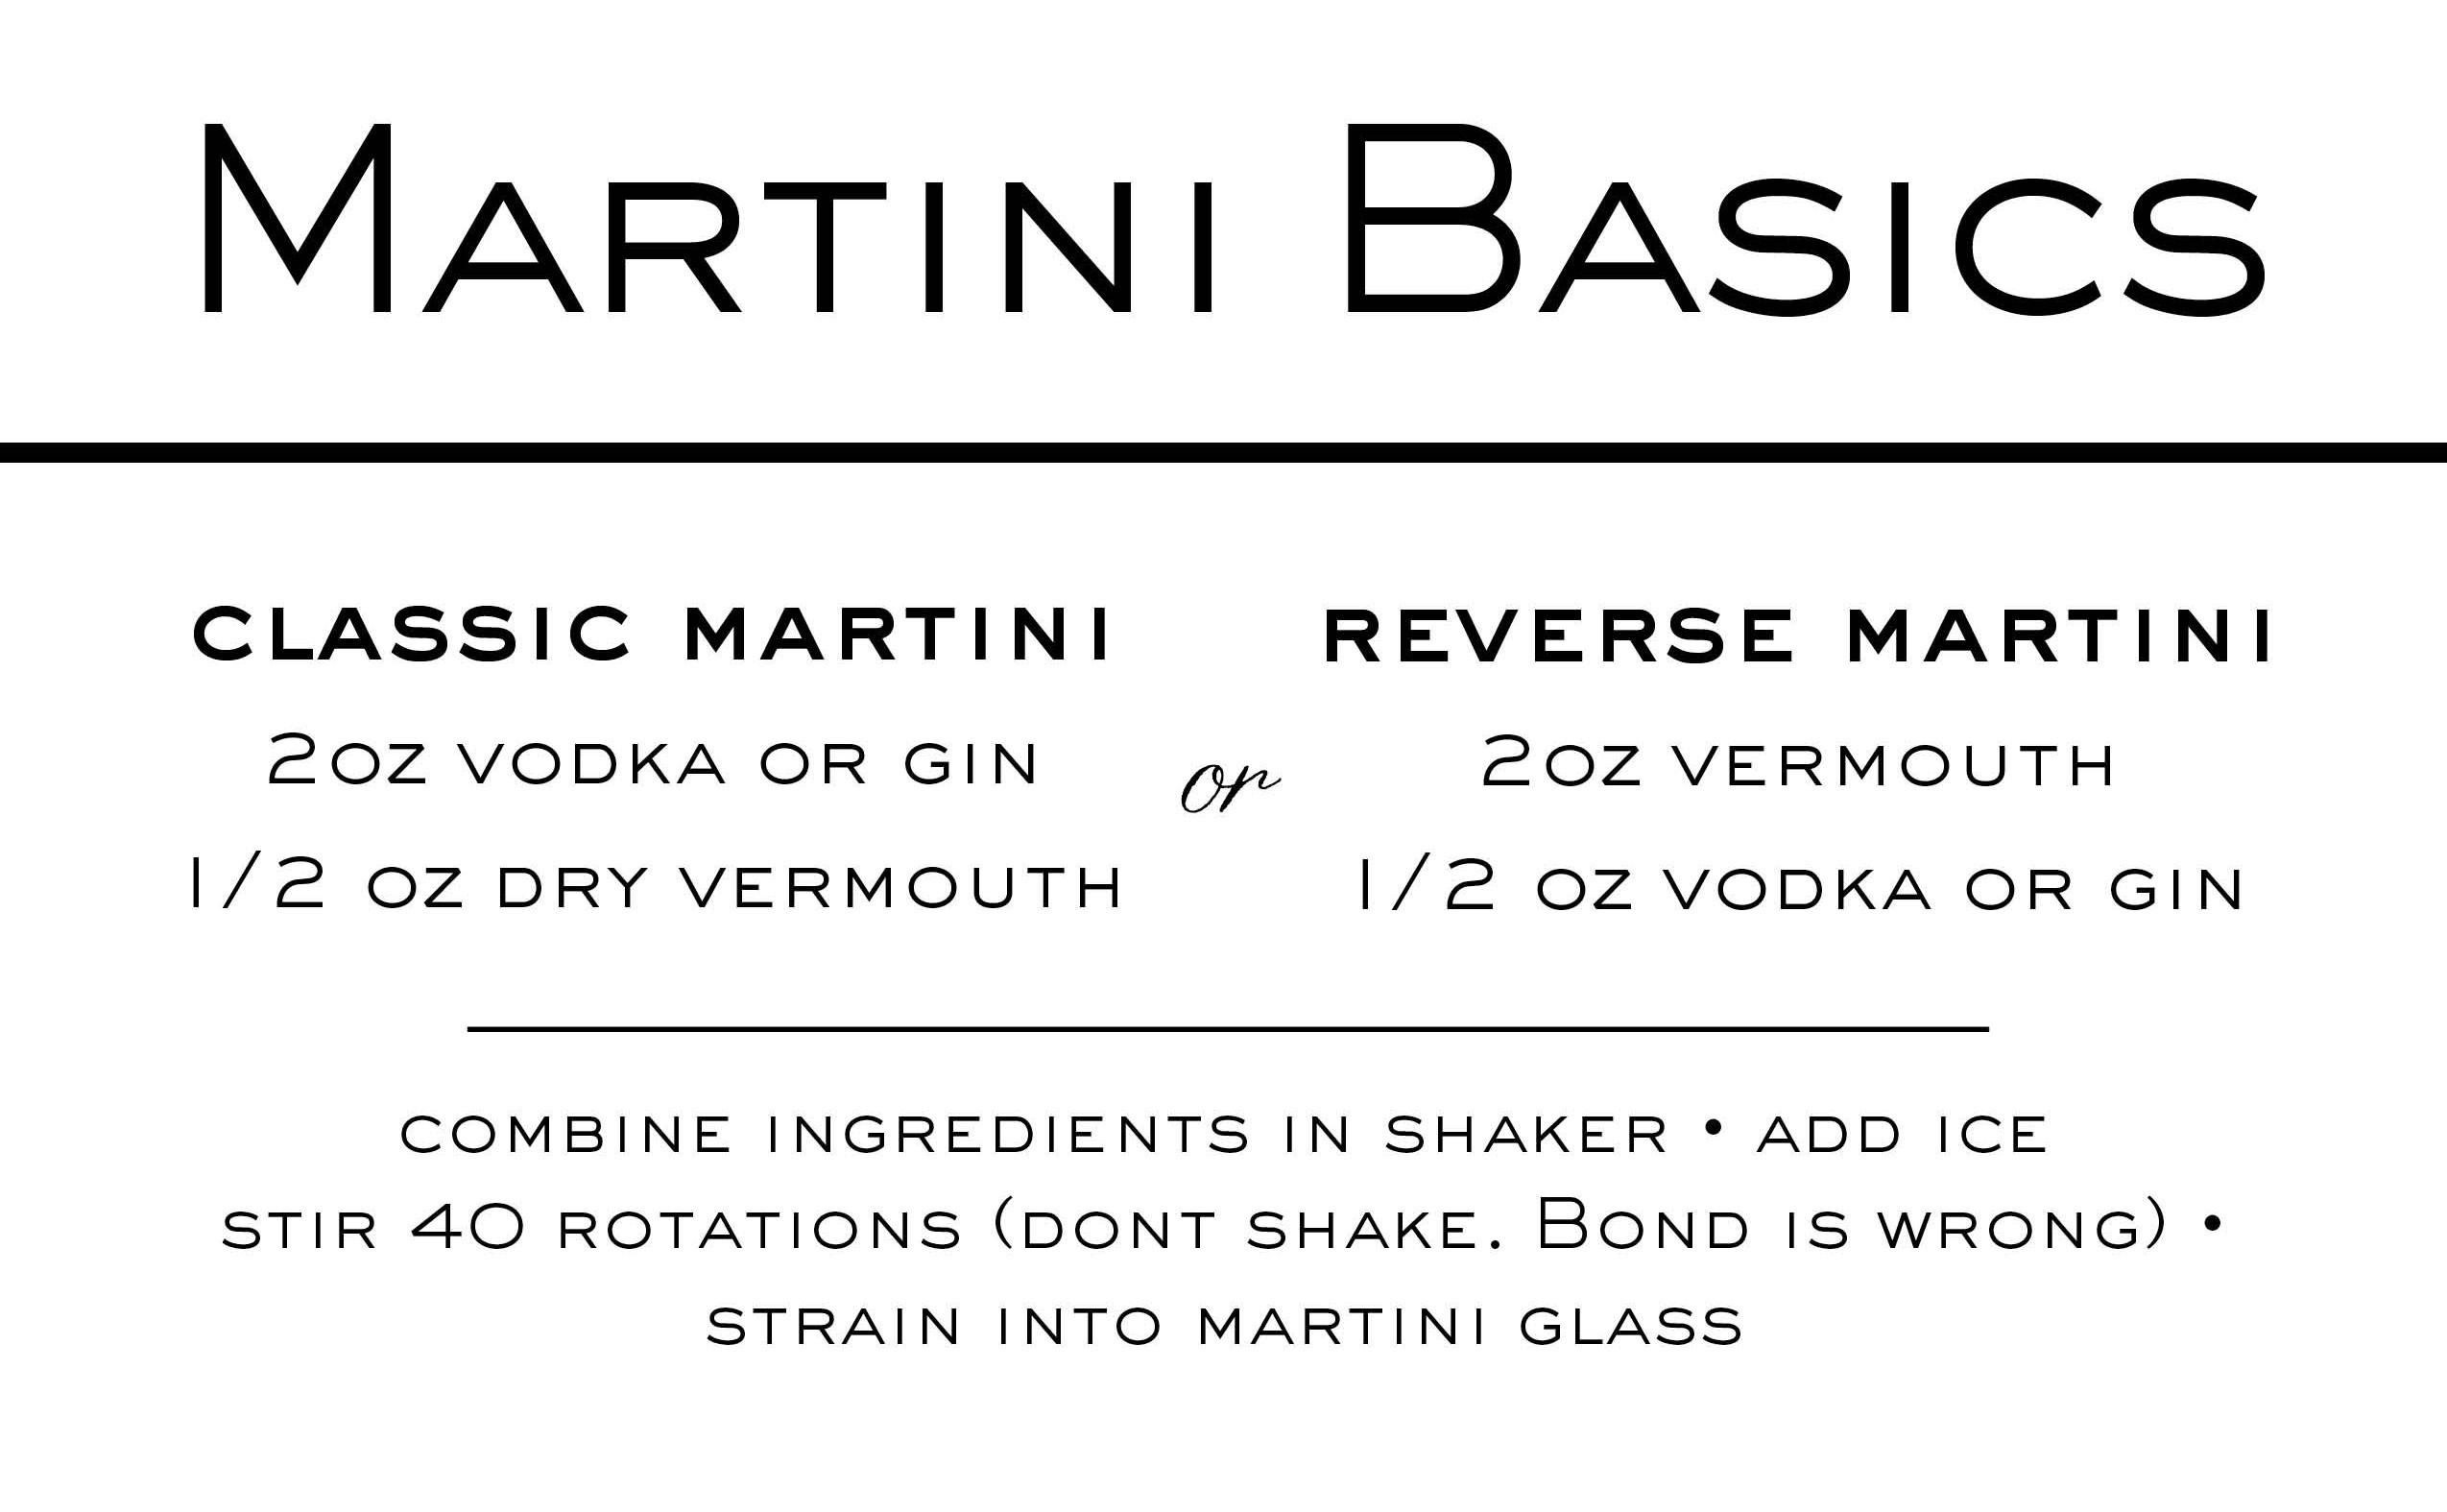 Martini Basics Tent Card